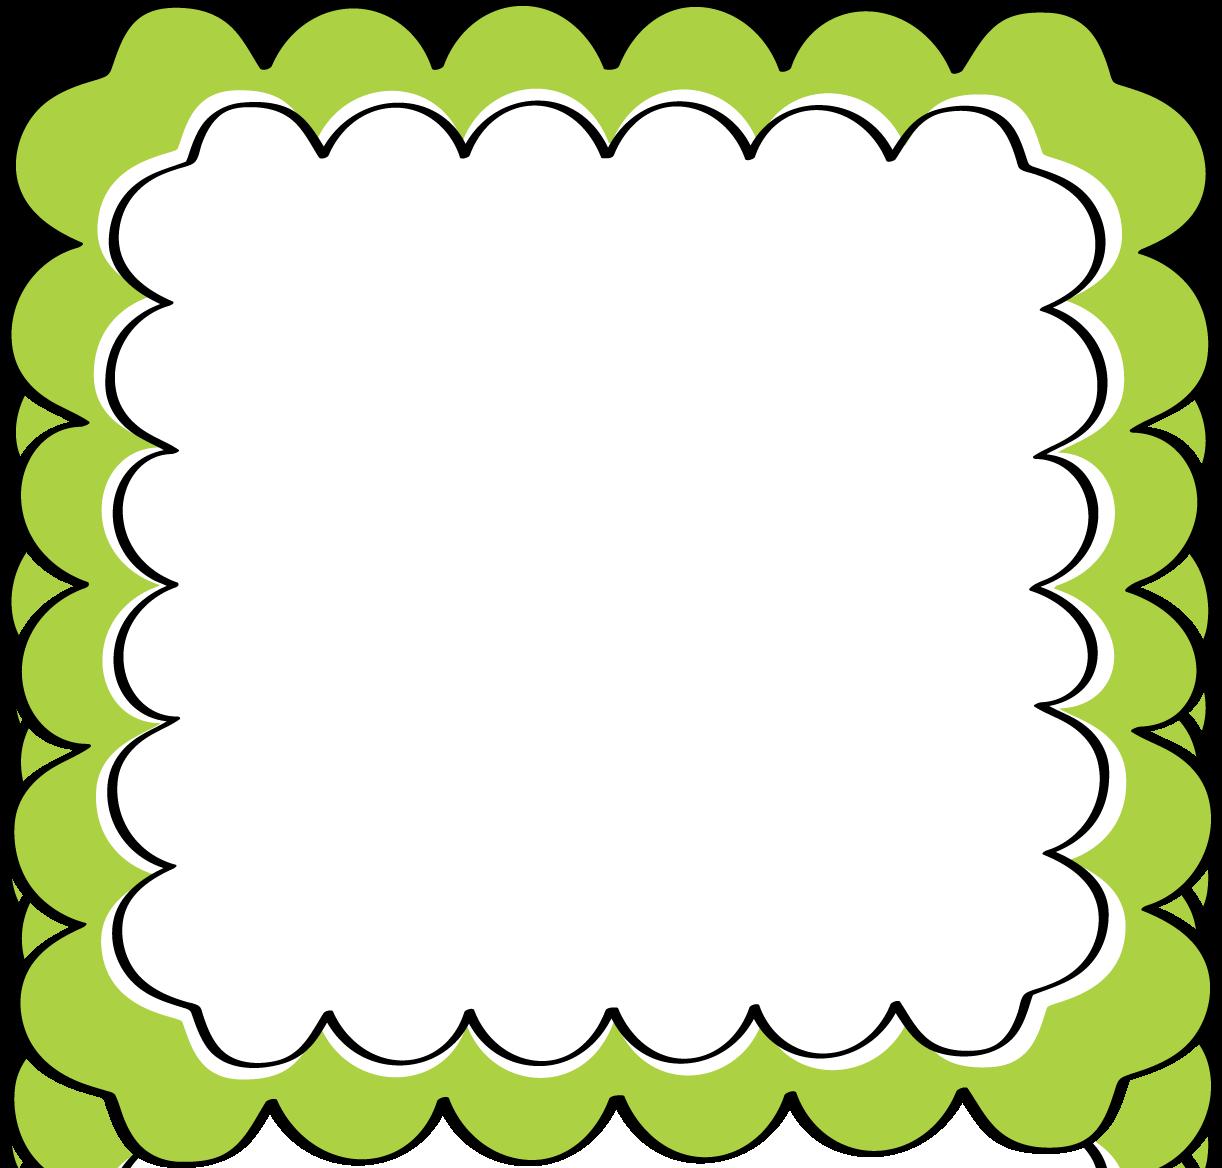 1222x1168 Free Scallop Clipart Image